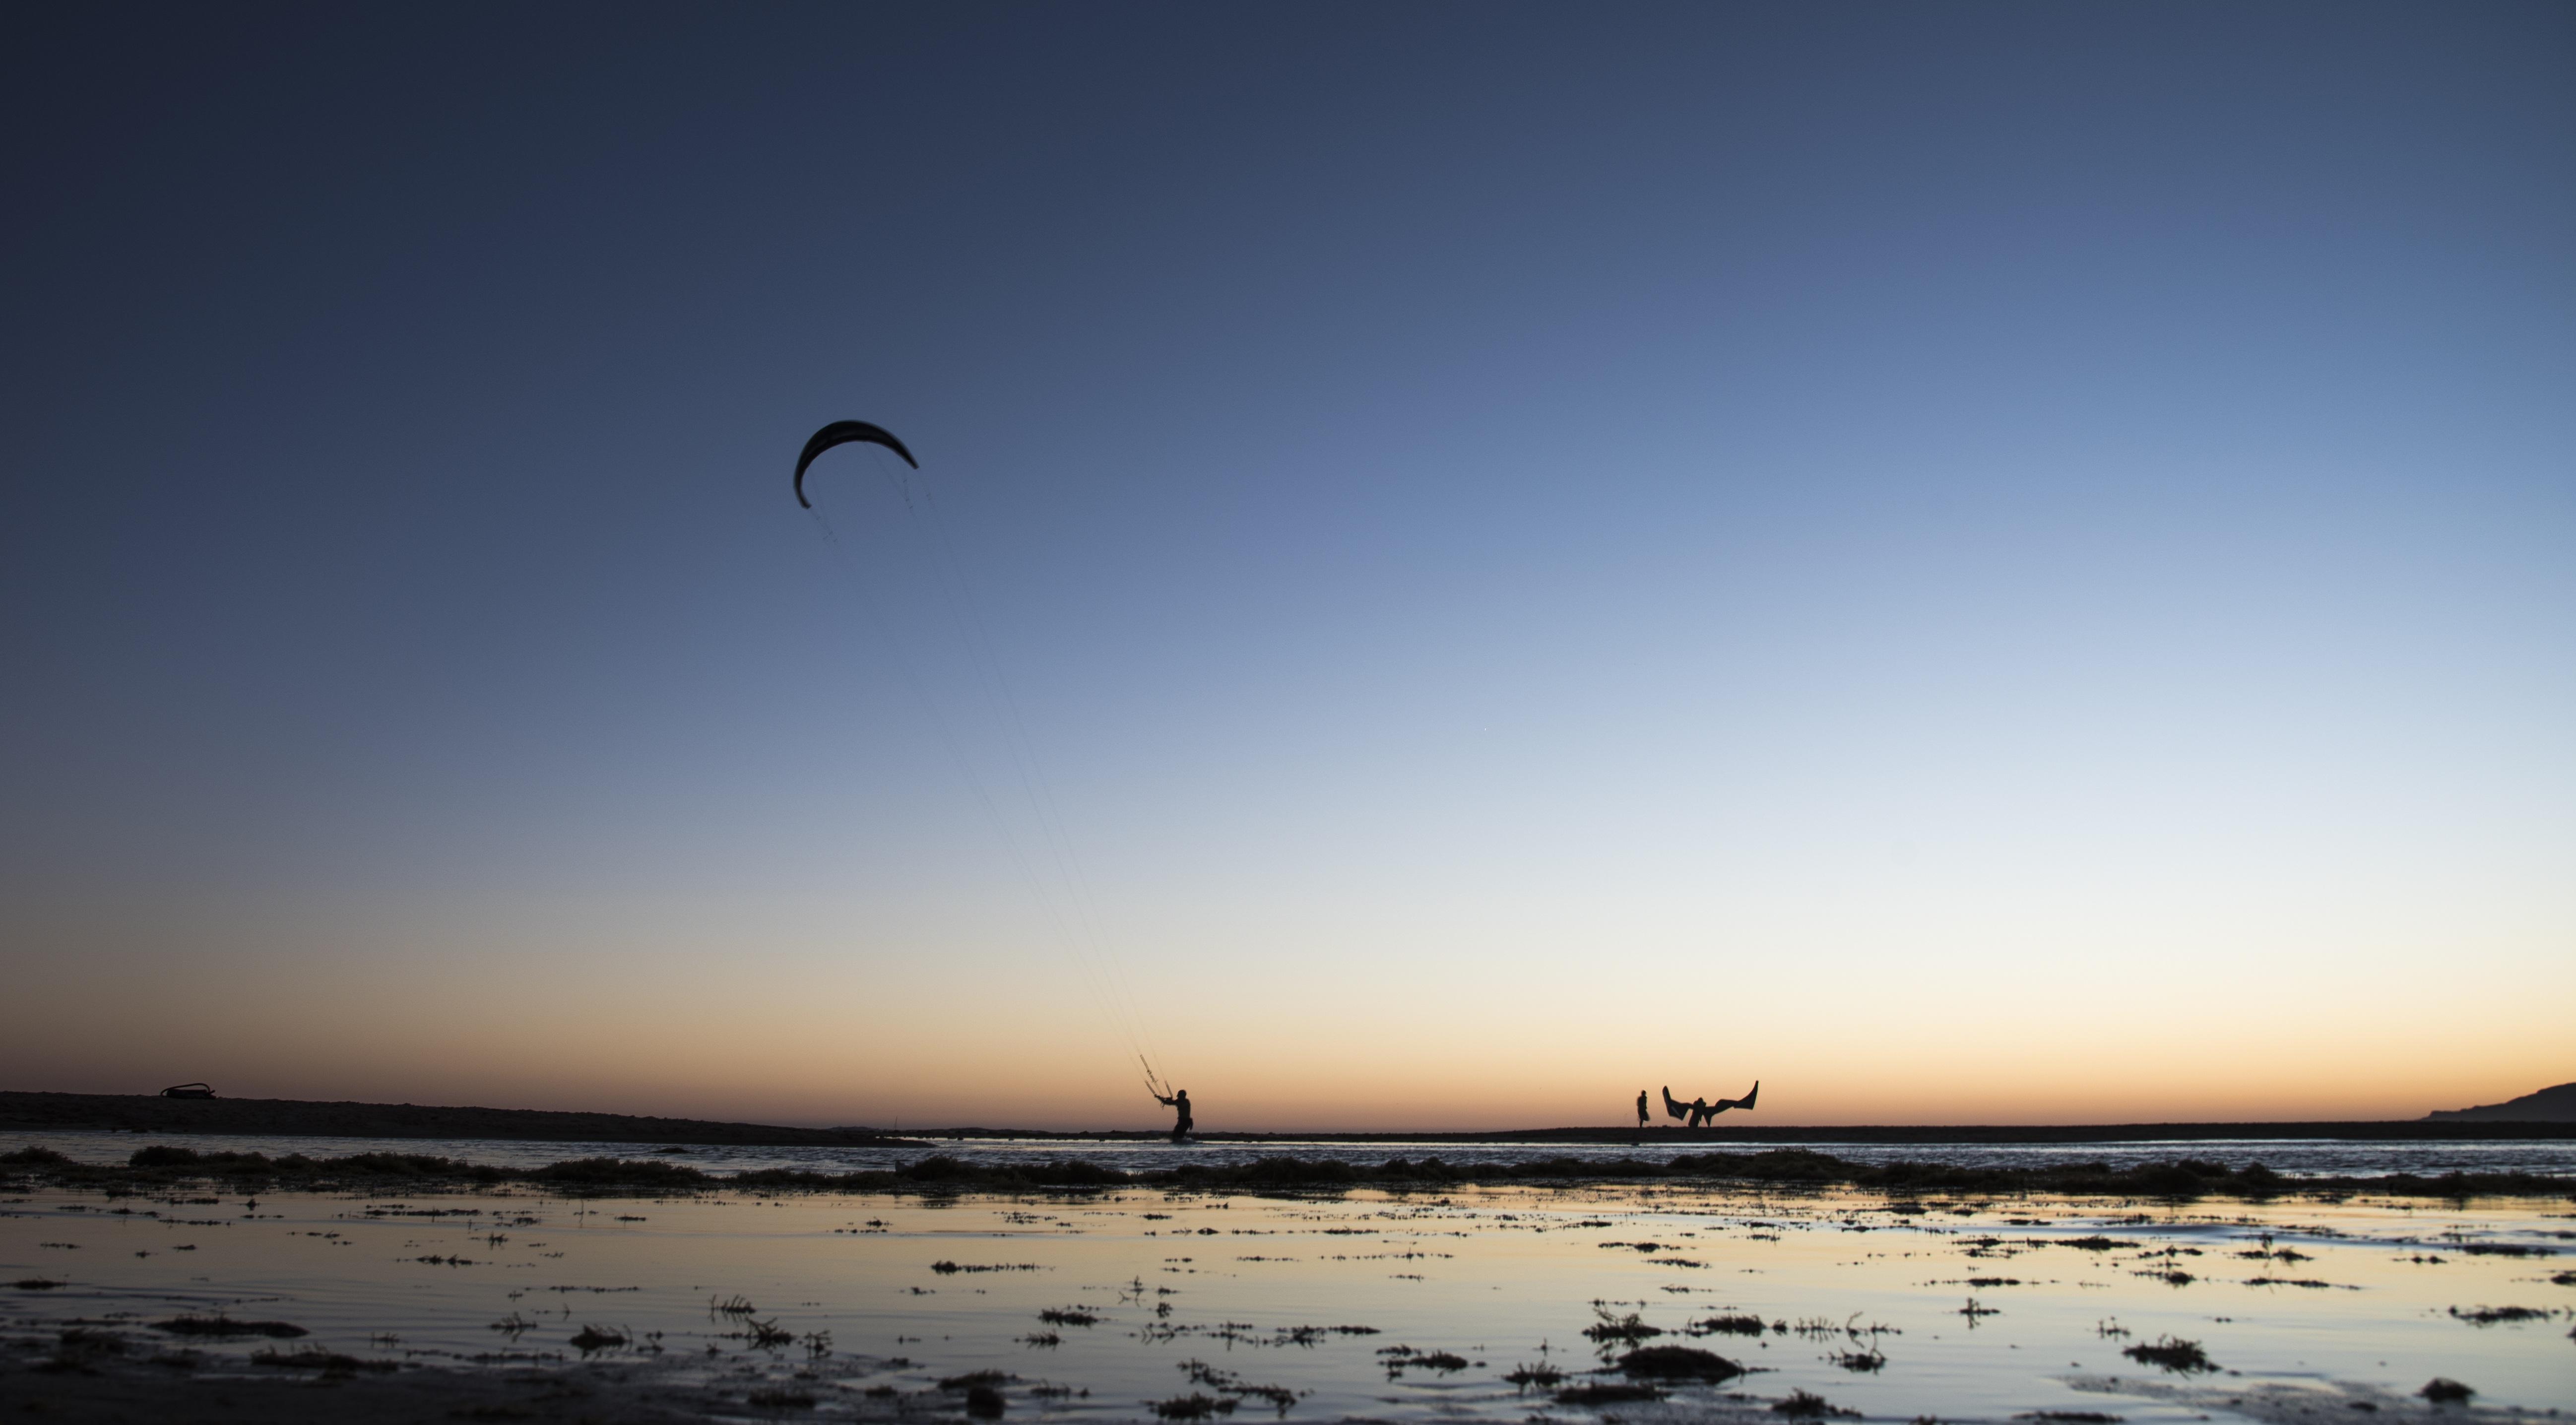 free images : beach, landscape, sea, coast, nature, ocean, horizon